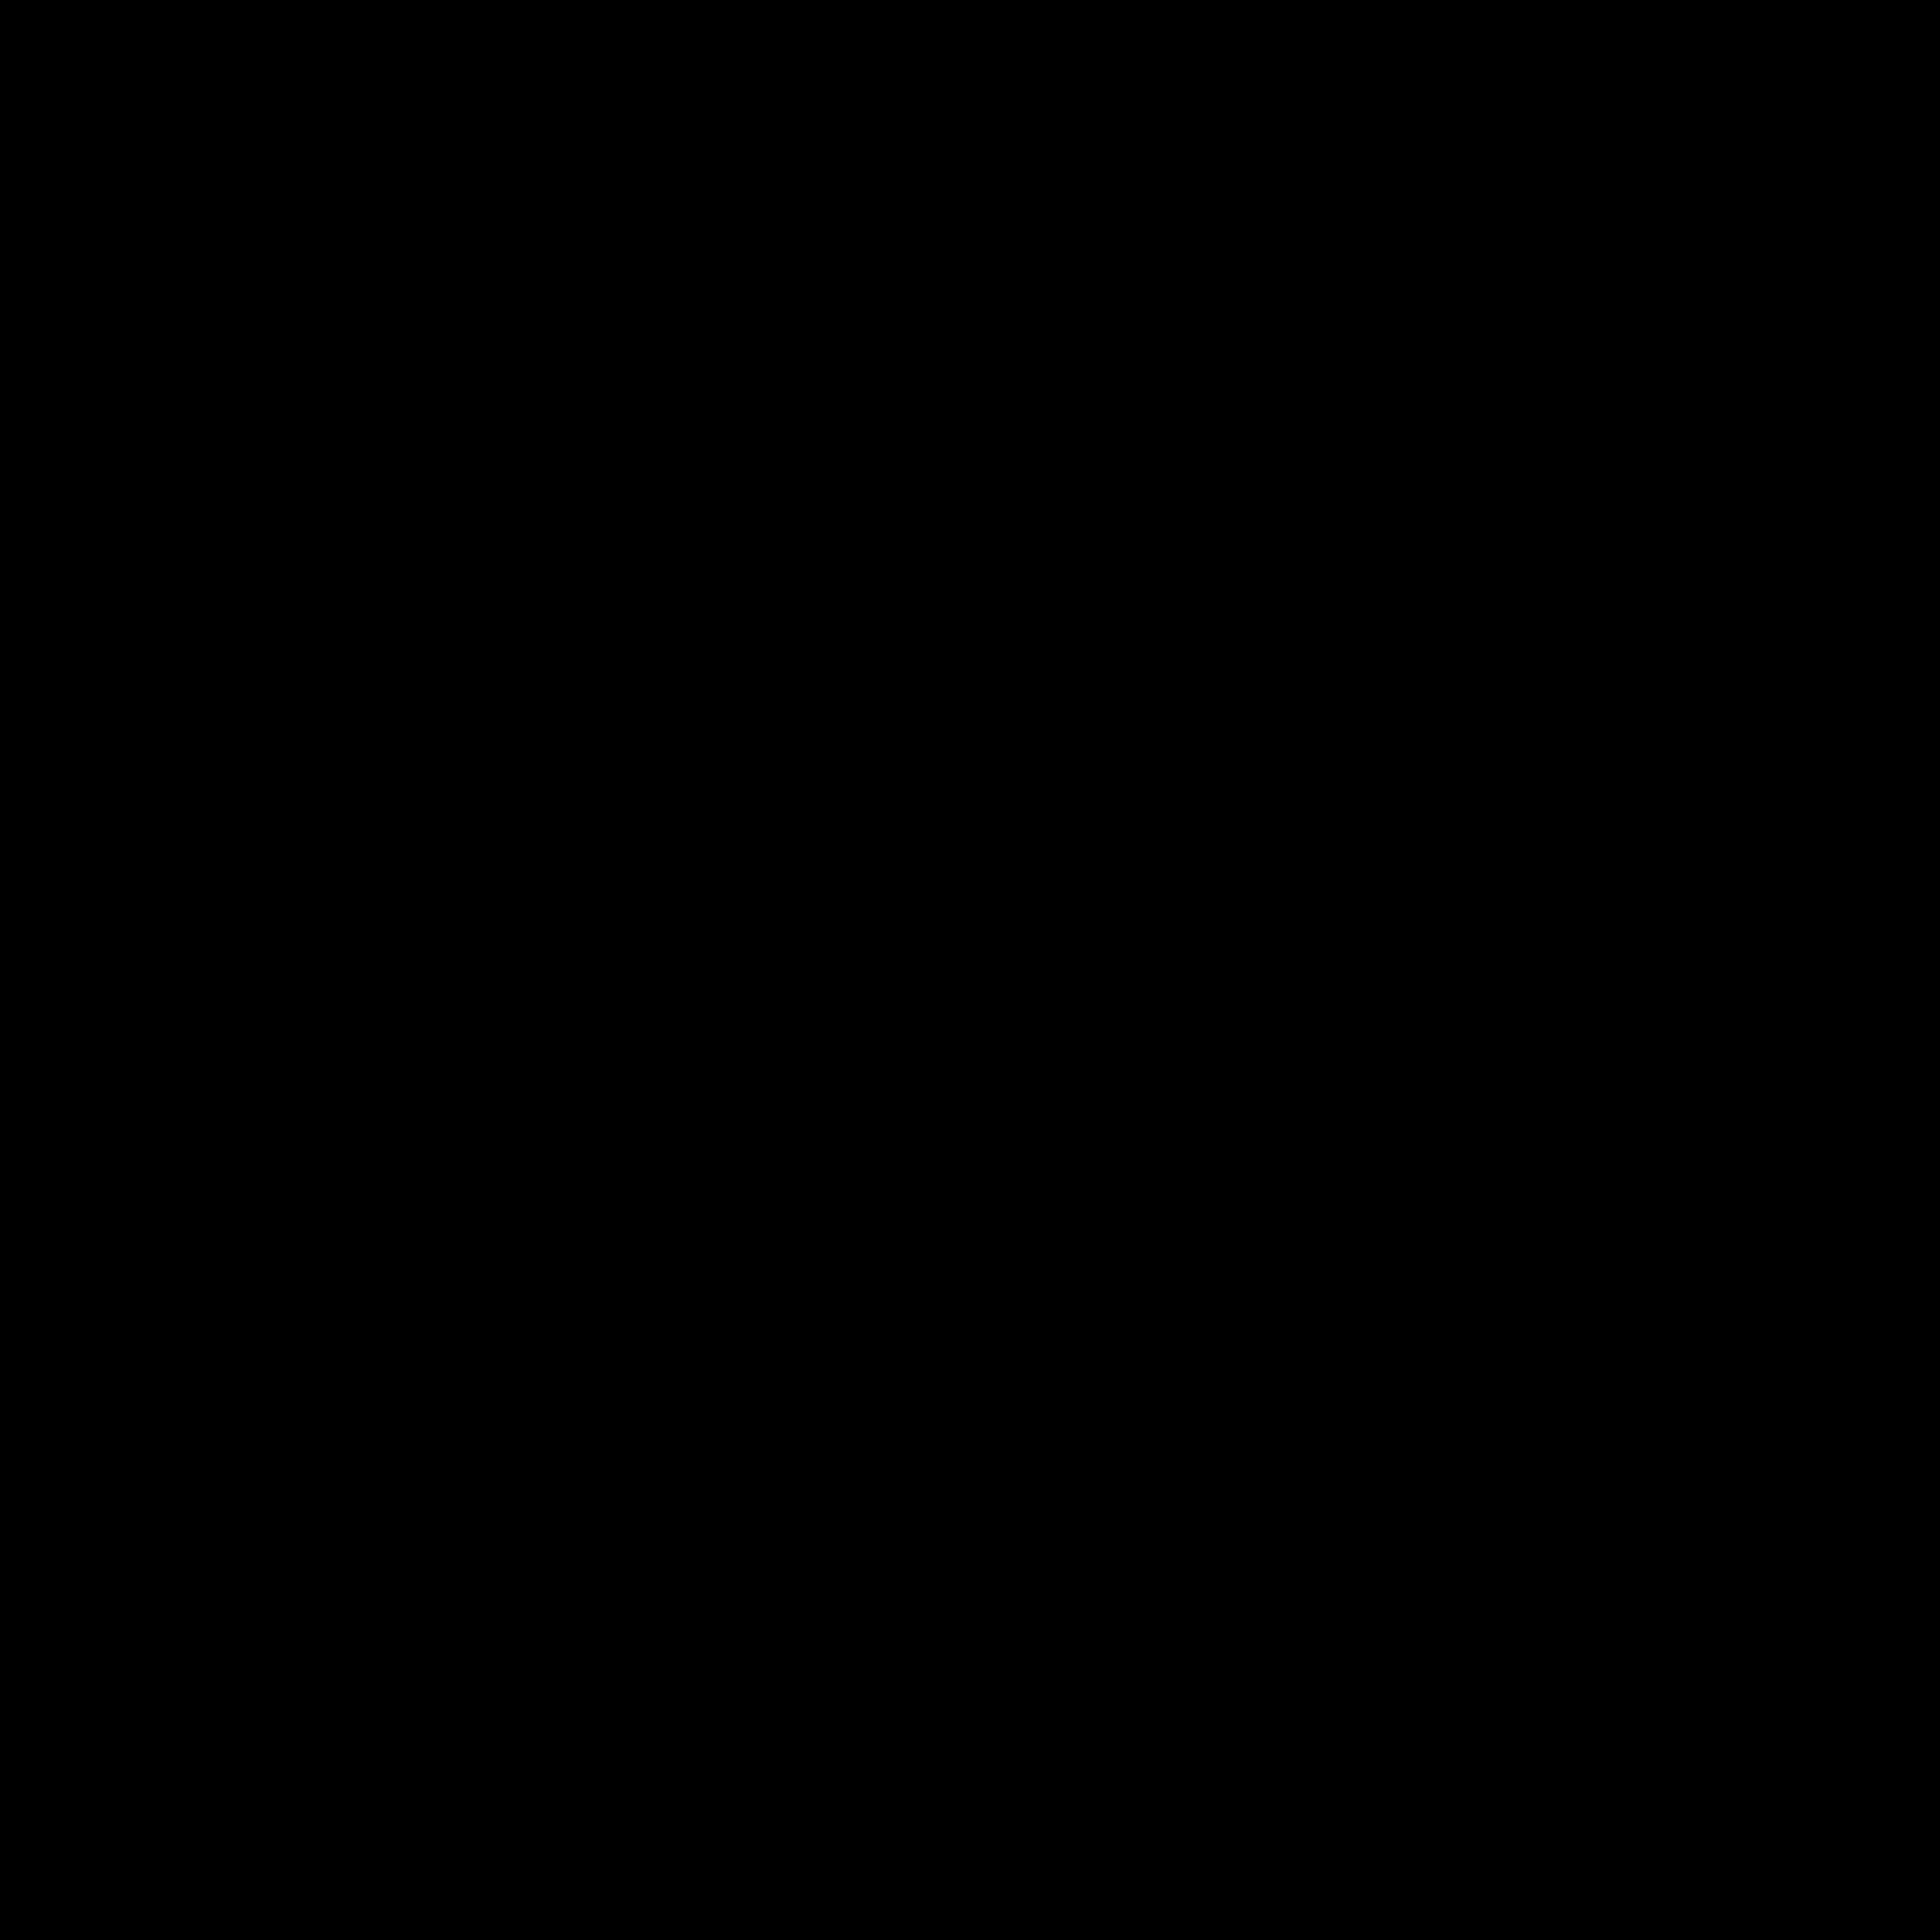 Bbc Logo Png Transparent & Svg Vector - Pluspng Pluspng.com - Bbc Logo PNG